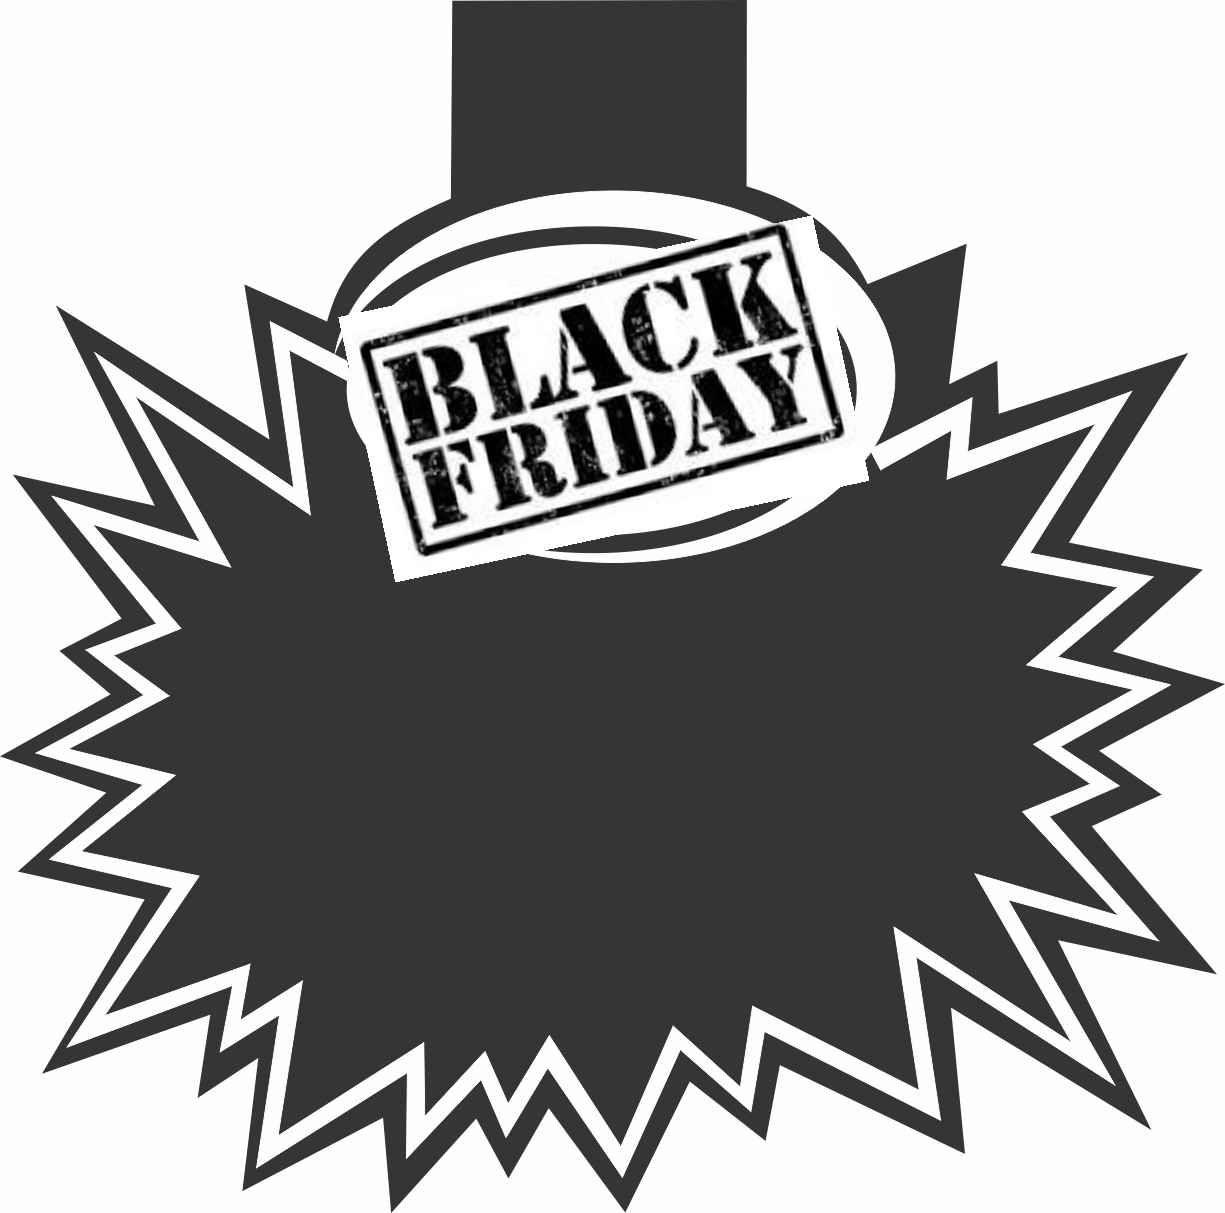 SPLASH BLACK FRIDAY 21X21CM (C/50 UNIDADES)